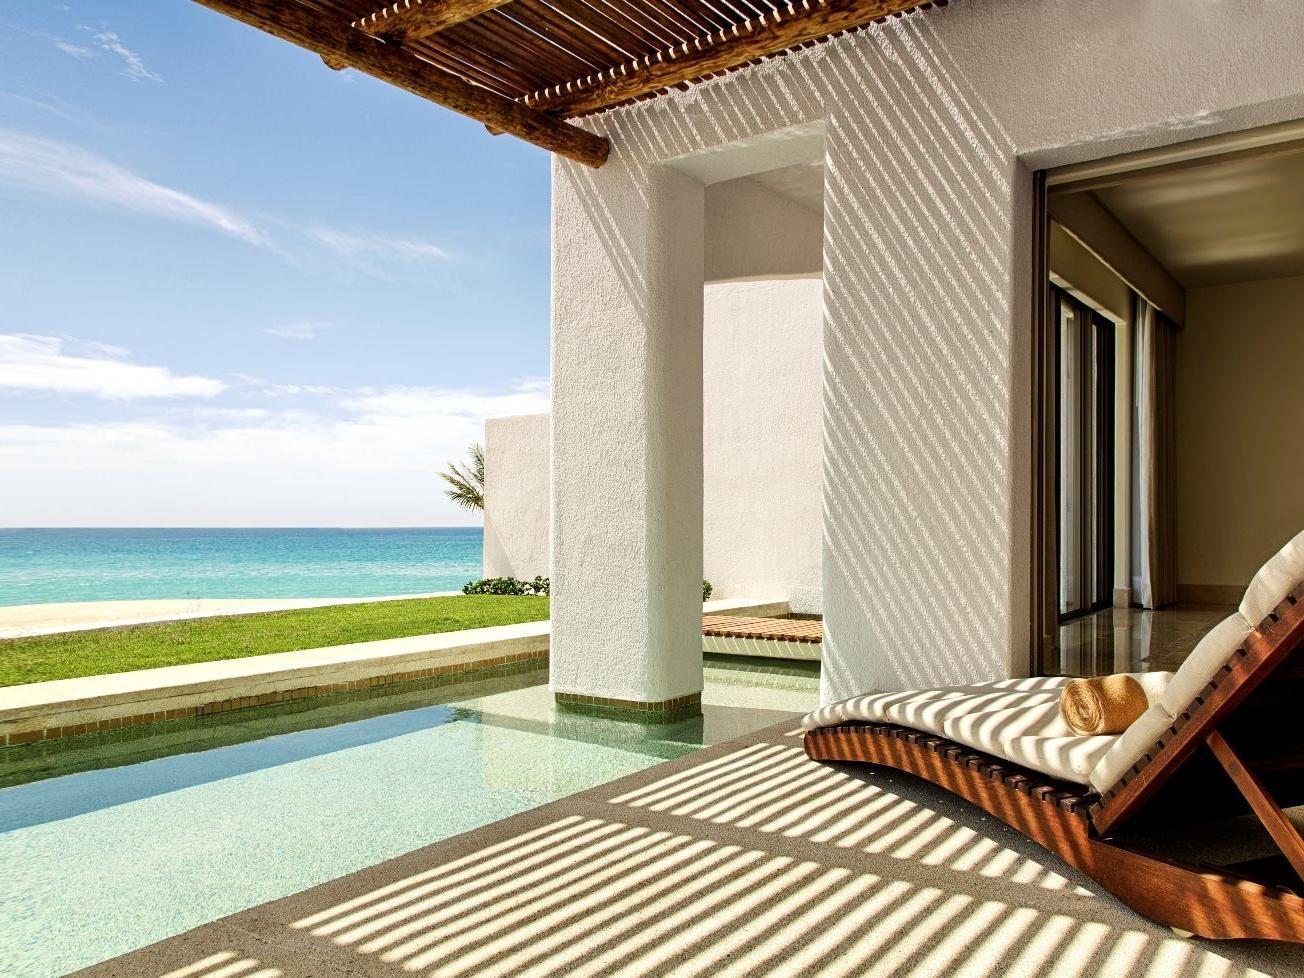 a lounge chair facing the ocean